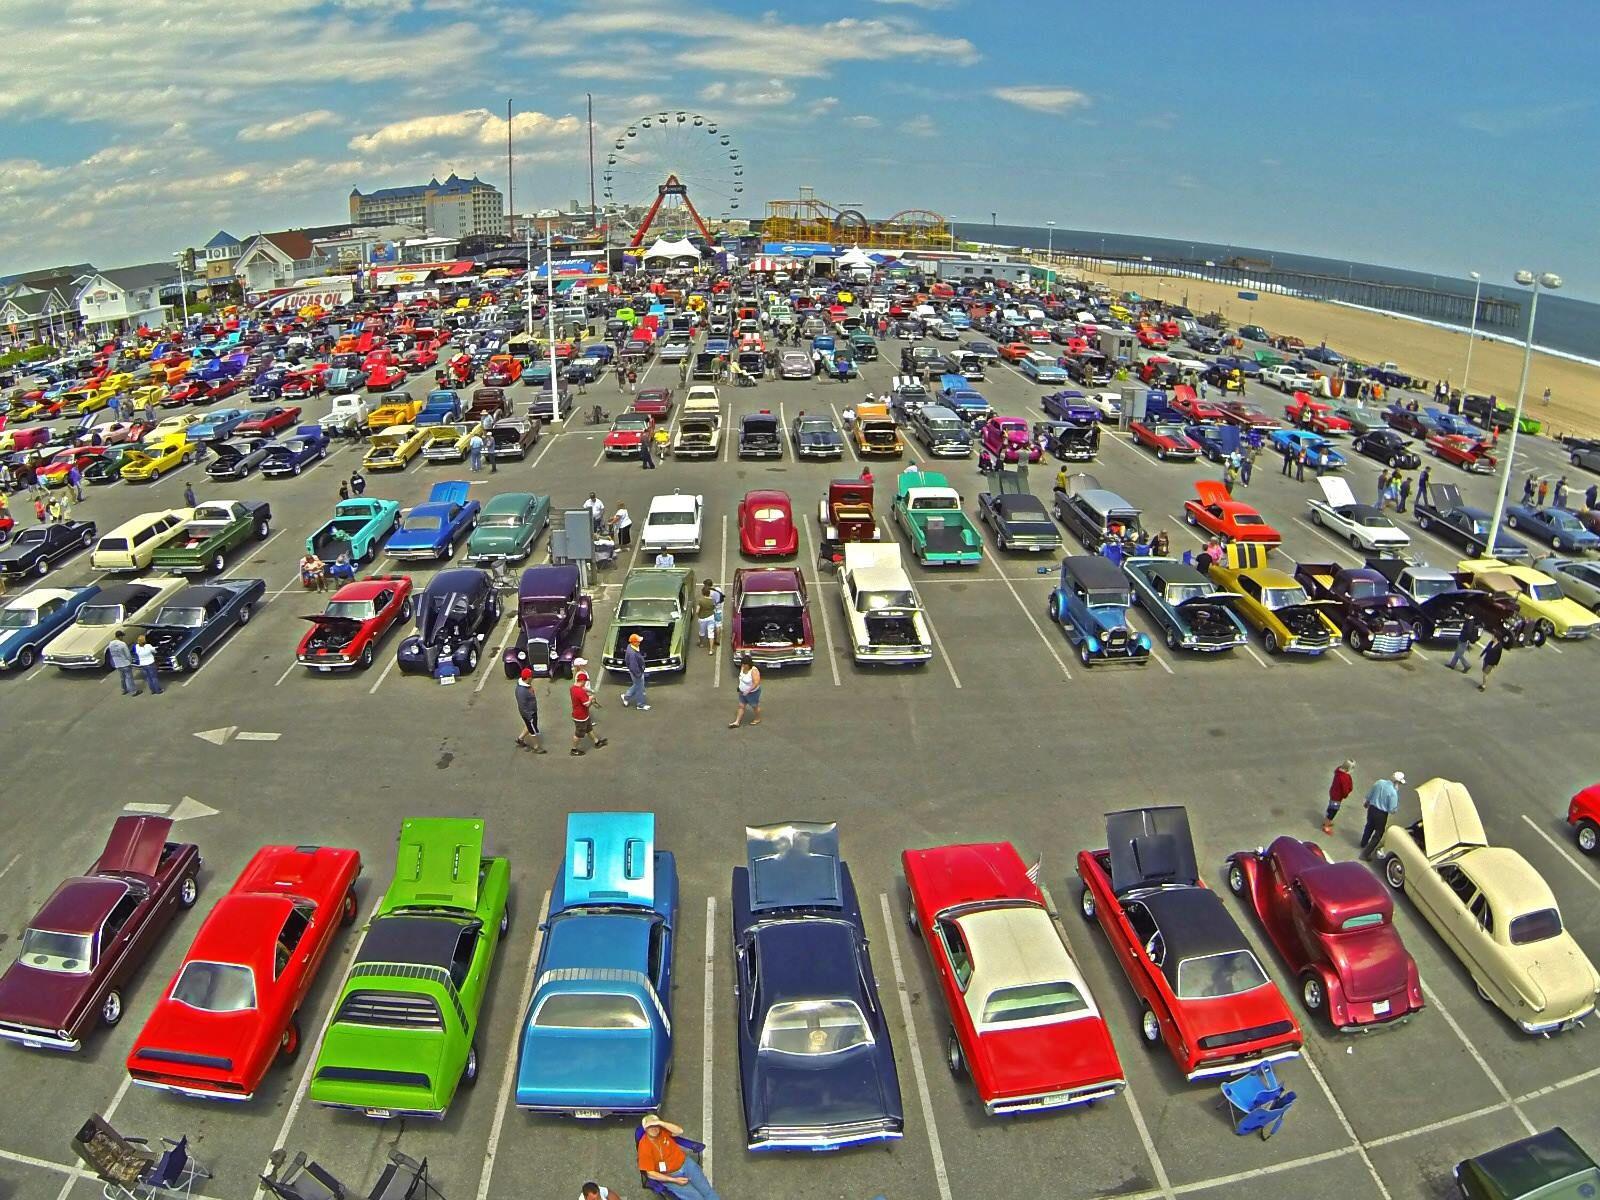 Ocean City Car Show Eastern Shore Love Pinterest City Car - Ocean city car show